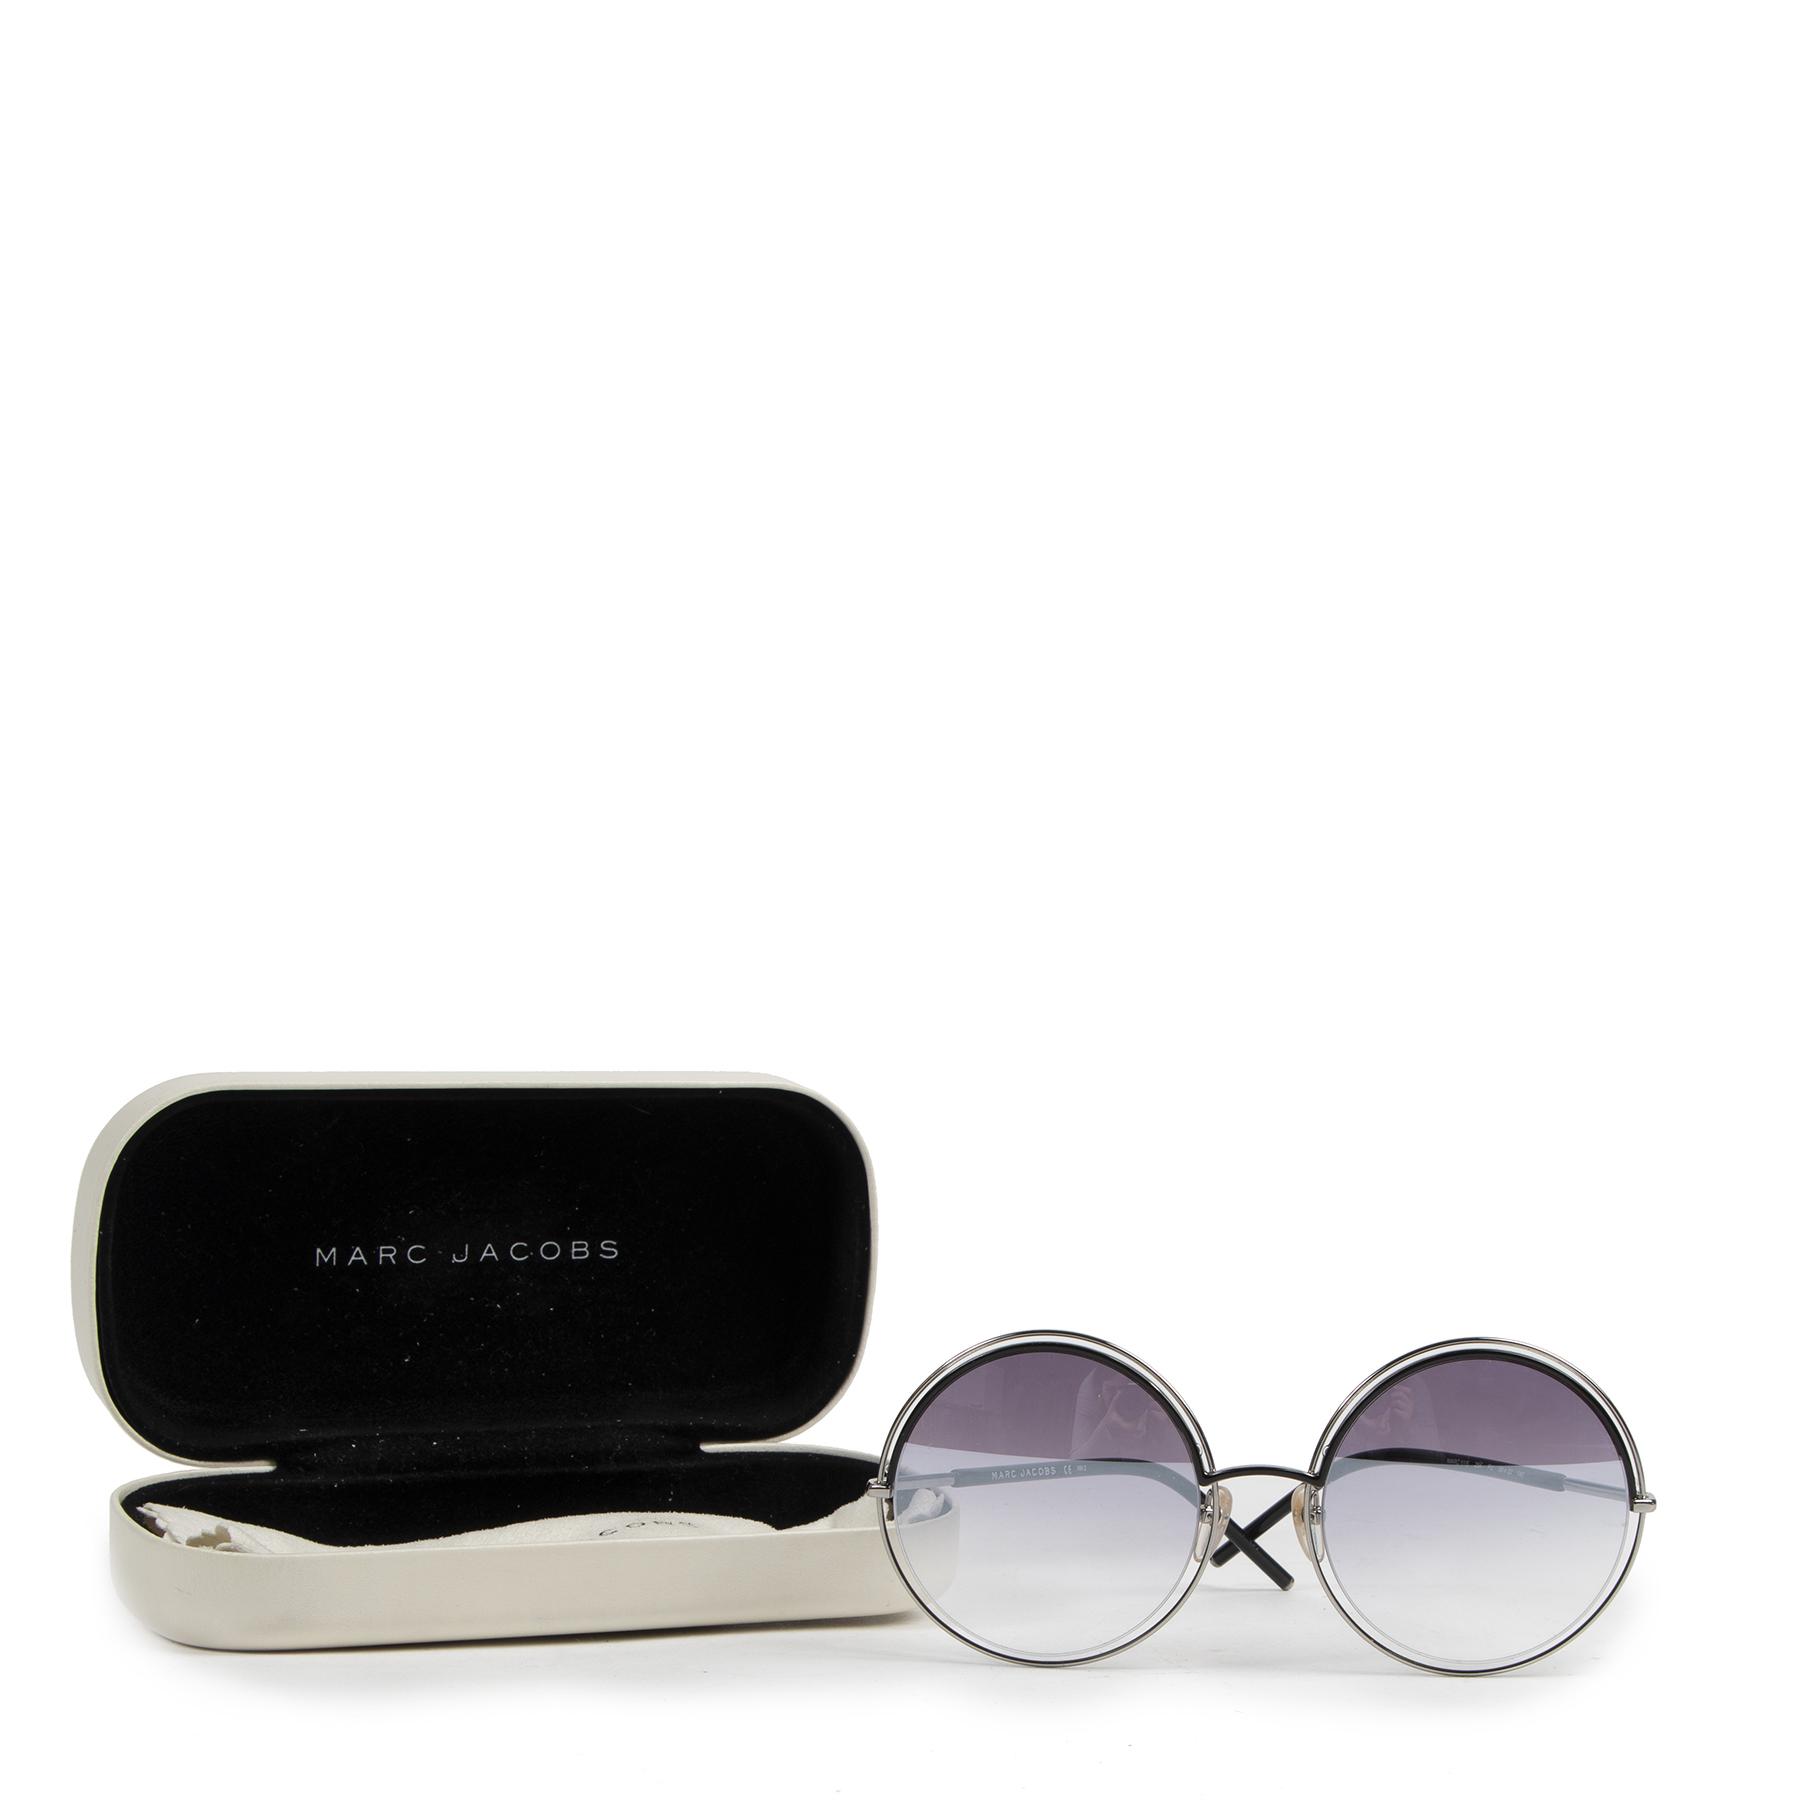 Authentic secondhand Marc Jacobs Black Marc 11s Round Sunglasses designer accessories fashion luxury vintage webshop safe secure online shopping